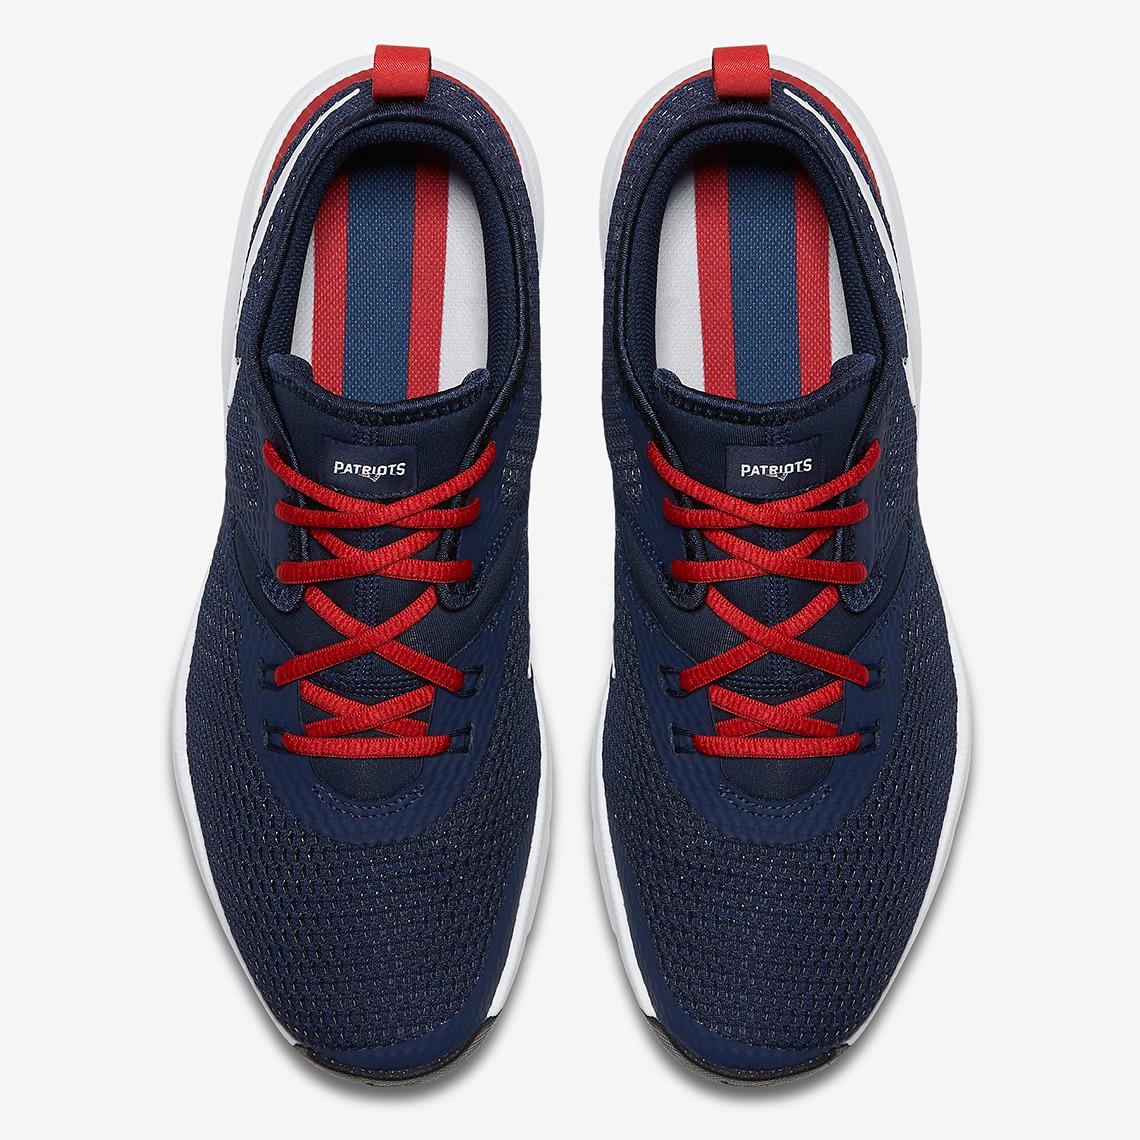 Nike Air Max Typha 2 Sneaker Patriots Nike Air Max Typha 2 Sneaker ... 83a2b7ffc